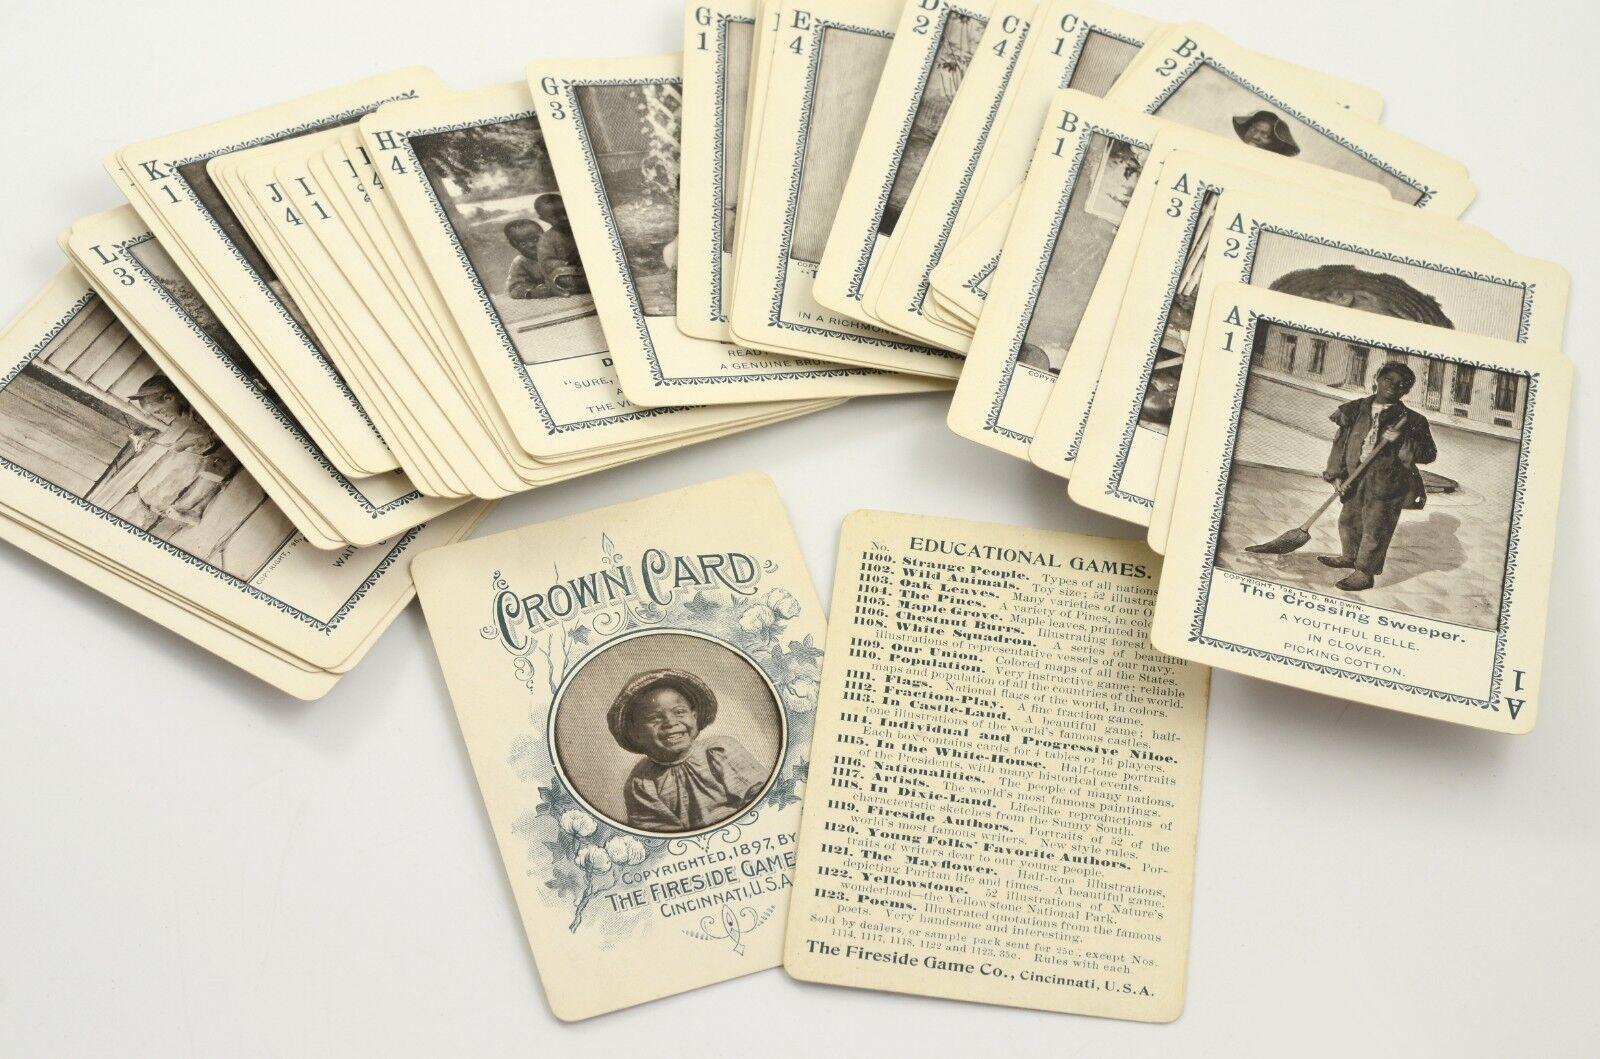 1897 ancien jeu de cartes  éducatif  USA populations blackes américaines FIRESIDE